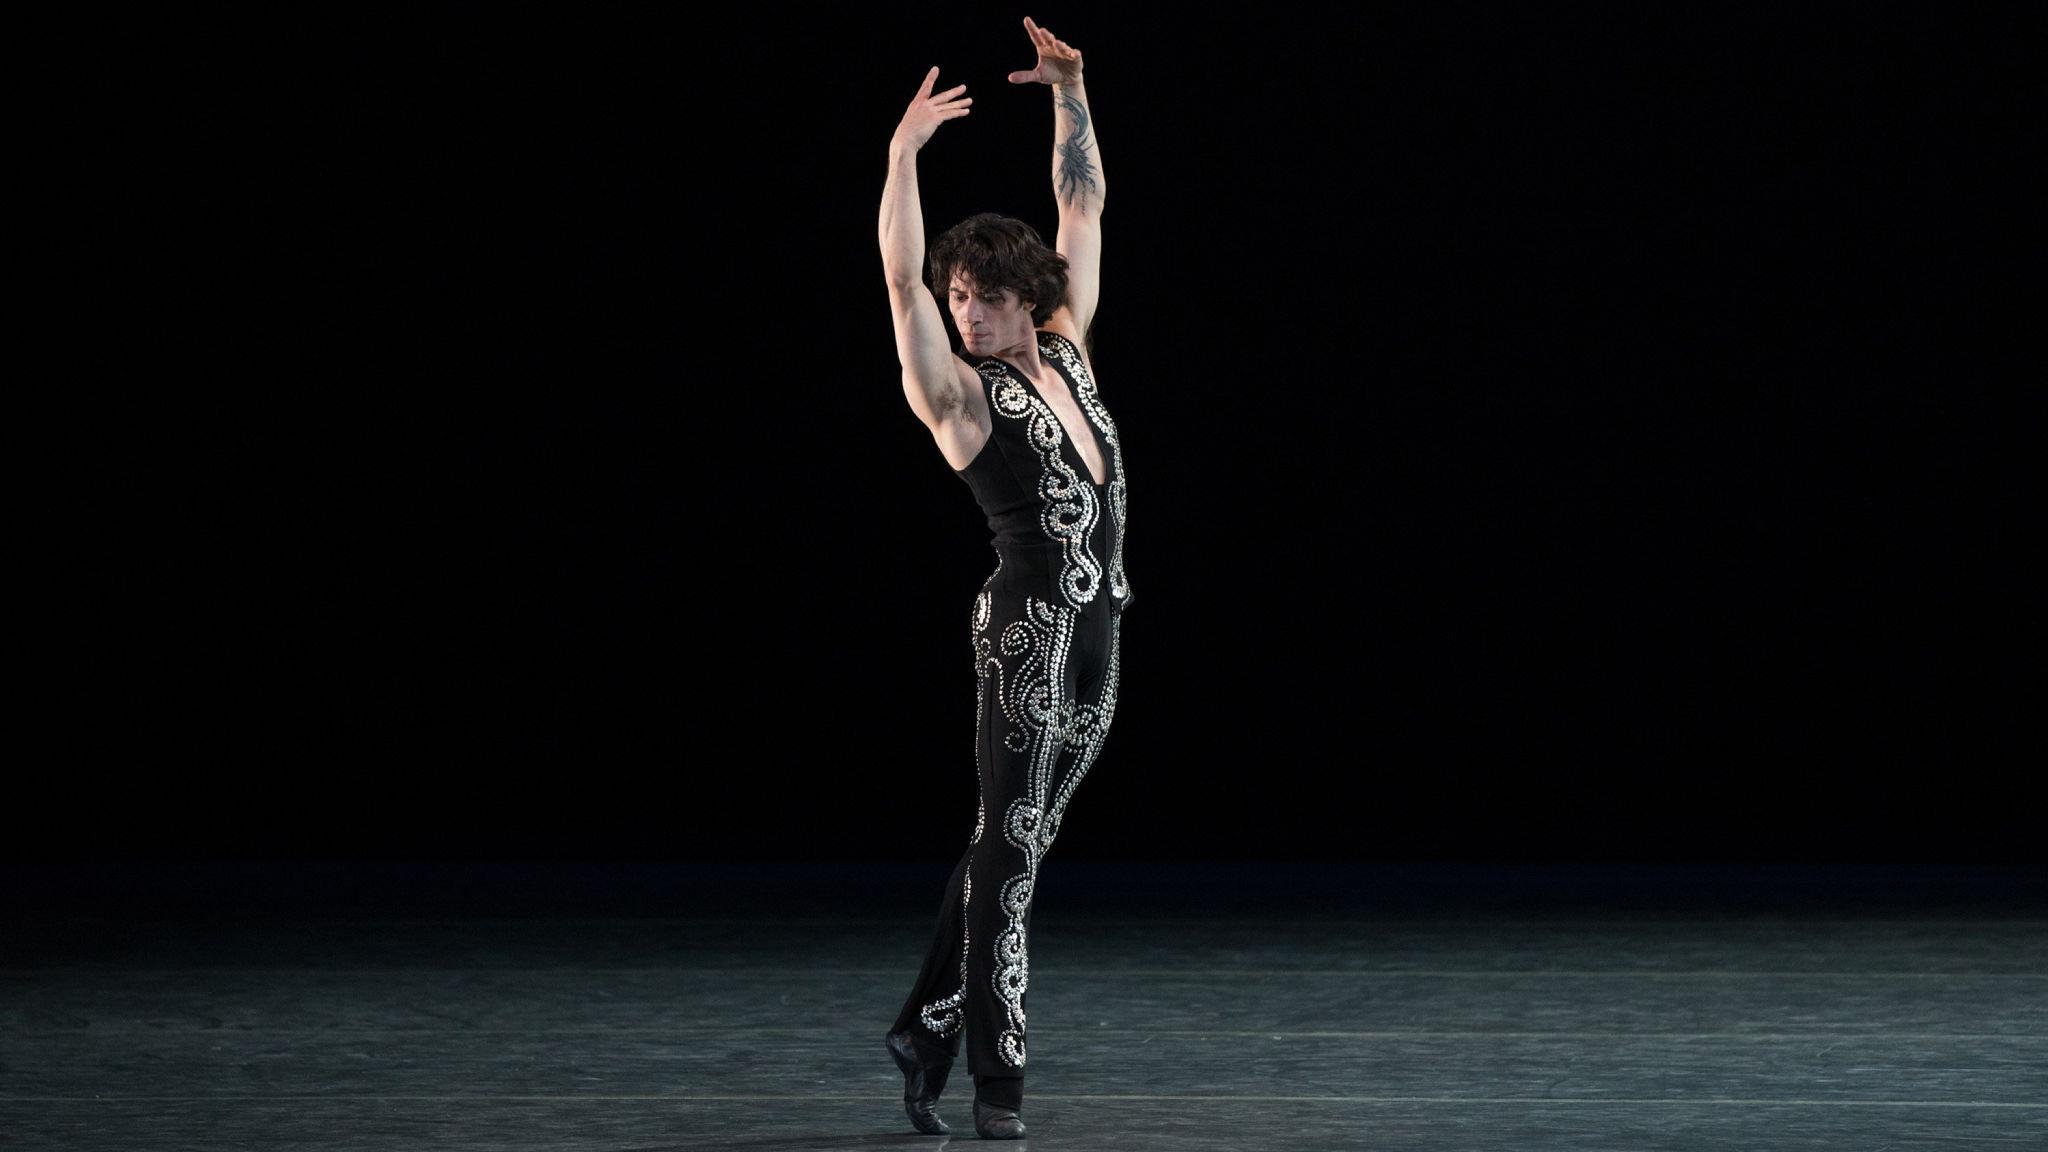 Anatomy of a Male Ballet Dancer - San Francisco Dance Film